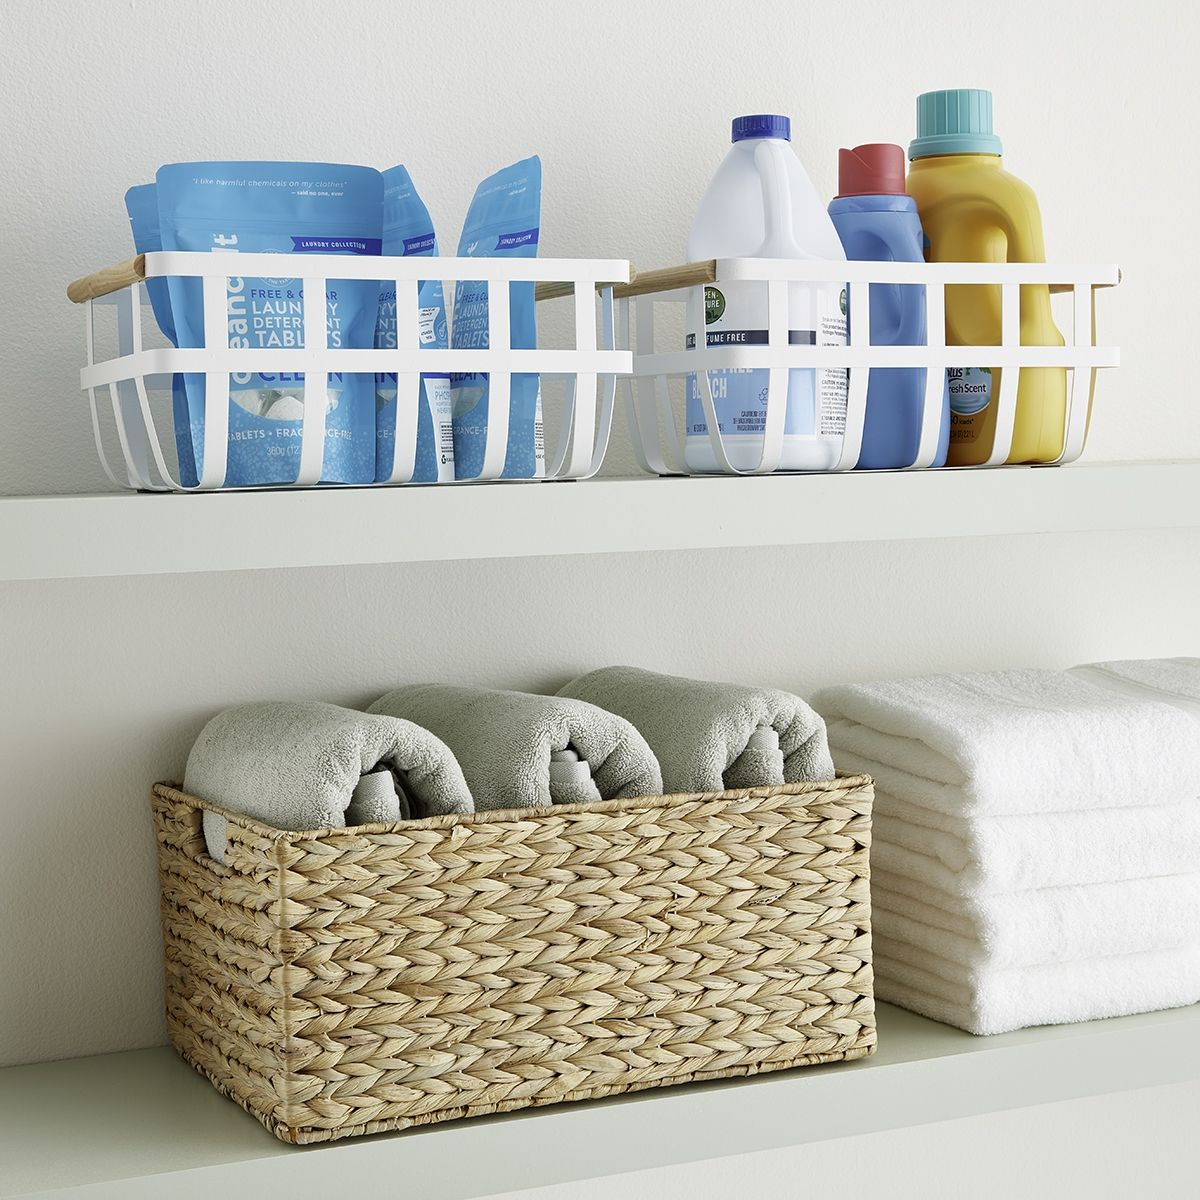 Laundry Room Storage Baskets Wooden Handles Laundry Decor